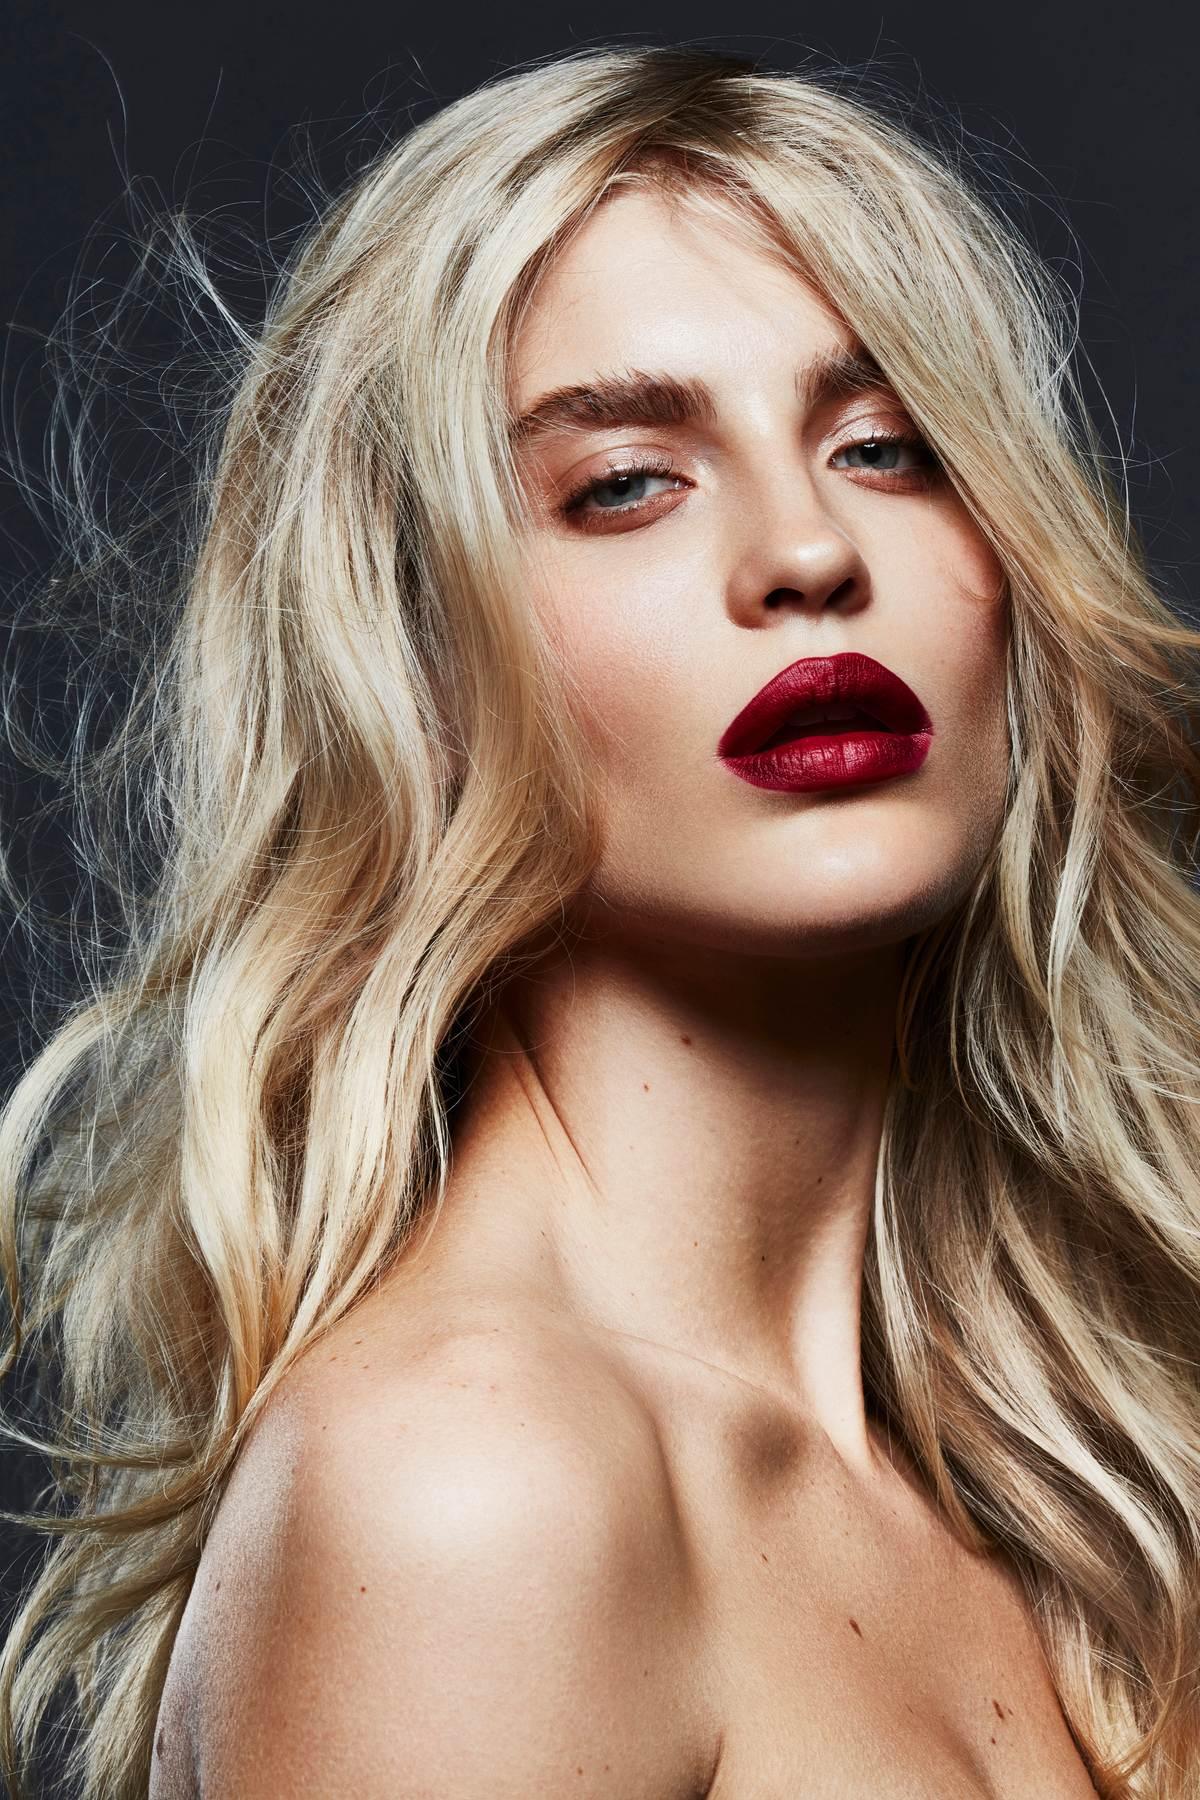 HAIR BEAUTY - L'OFFICIEL BALTIC OUTTAKE